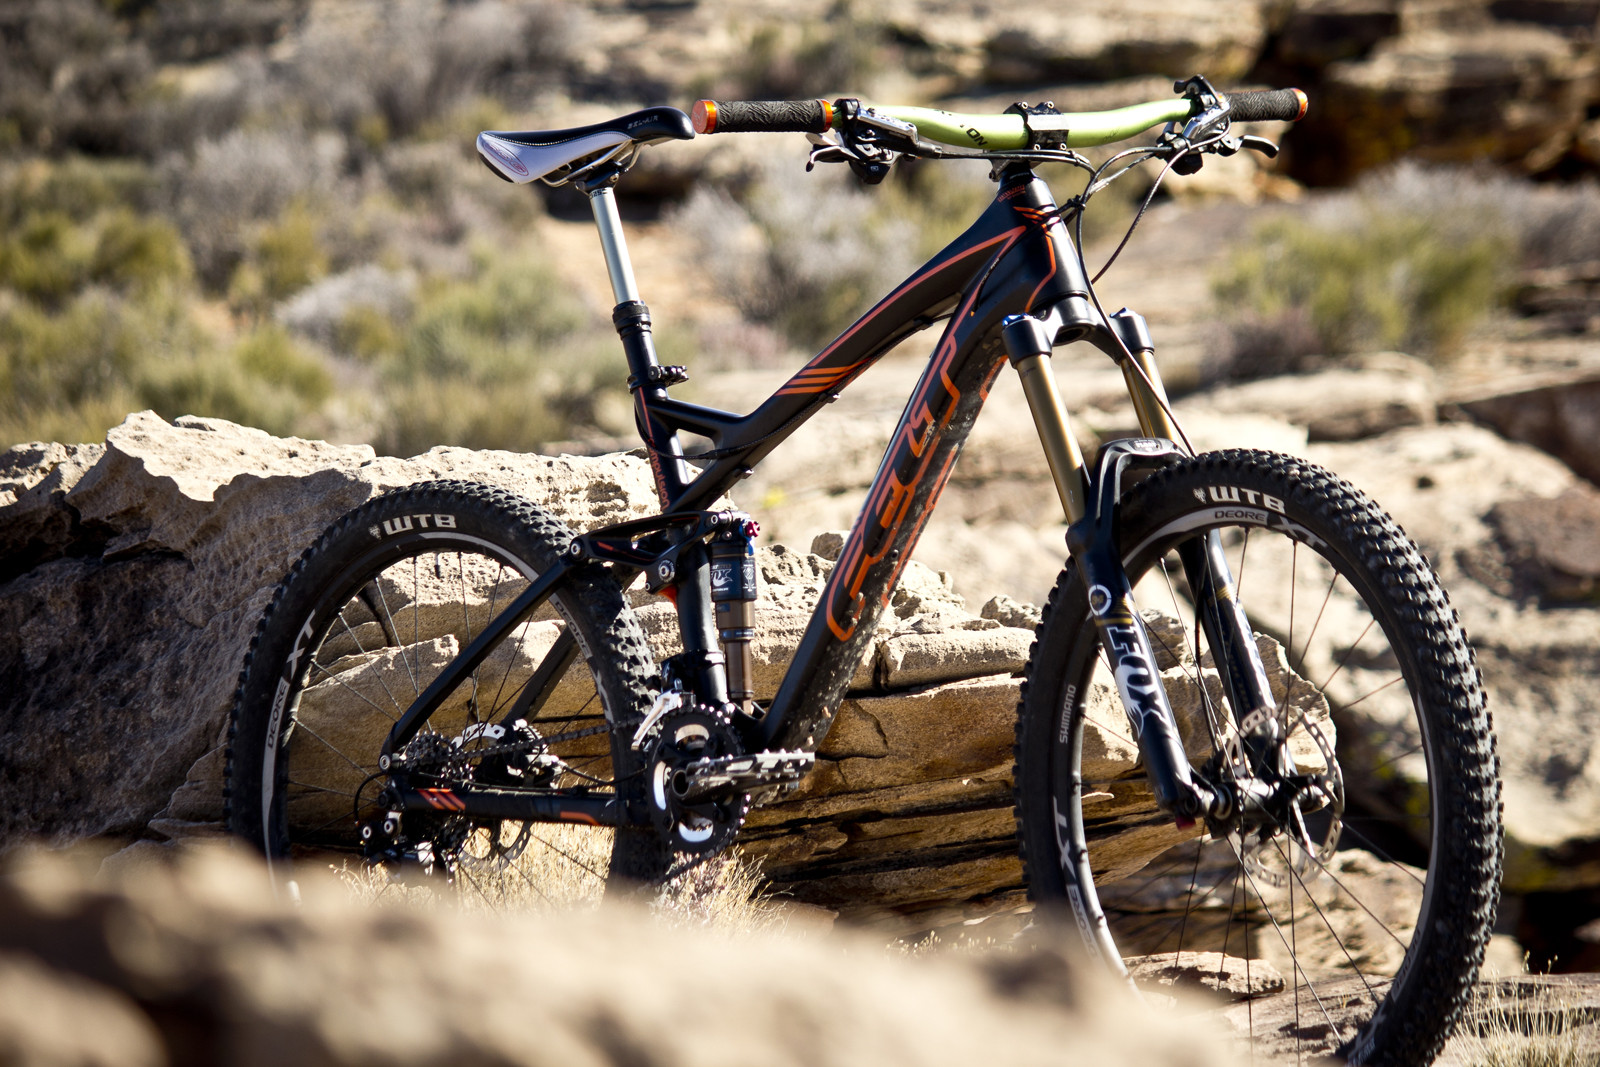 2013 Felt Compulsion LT 1 - Tested - 2013 Felt Compulsion LT 1 - Tested - Mountain Biking Pictures - Vital MTB